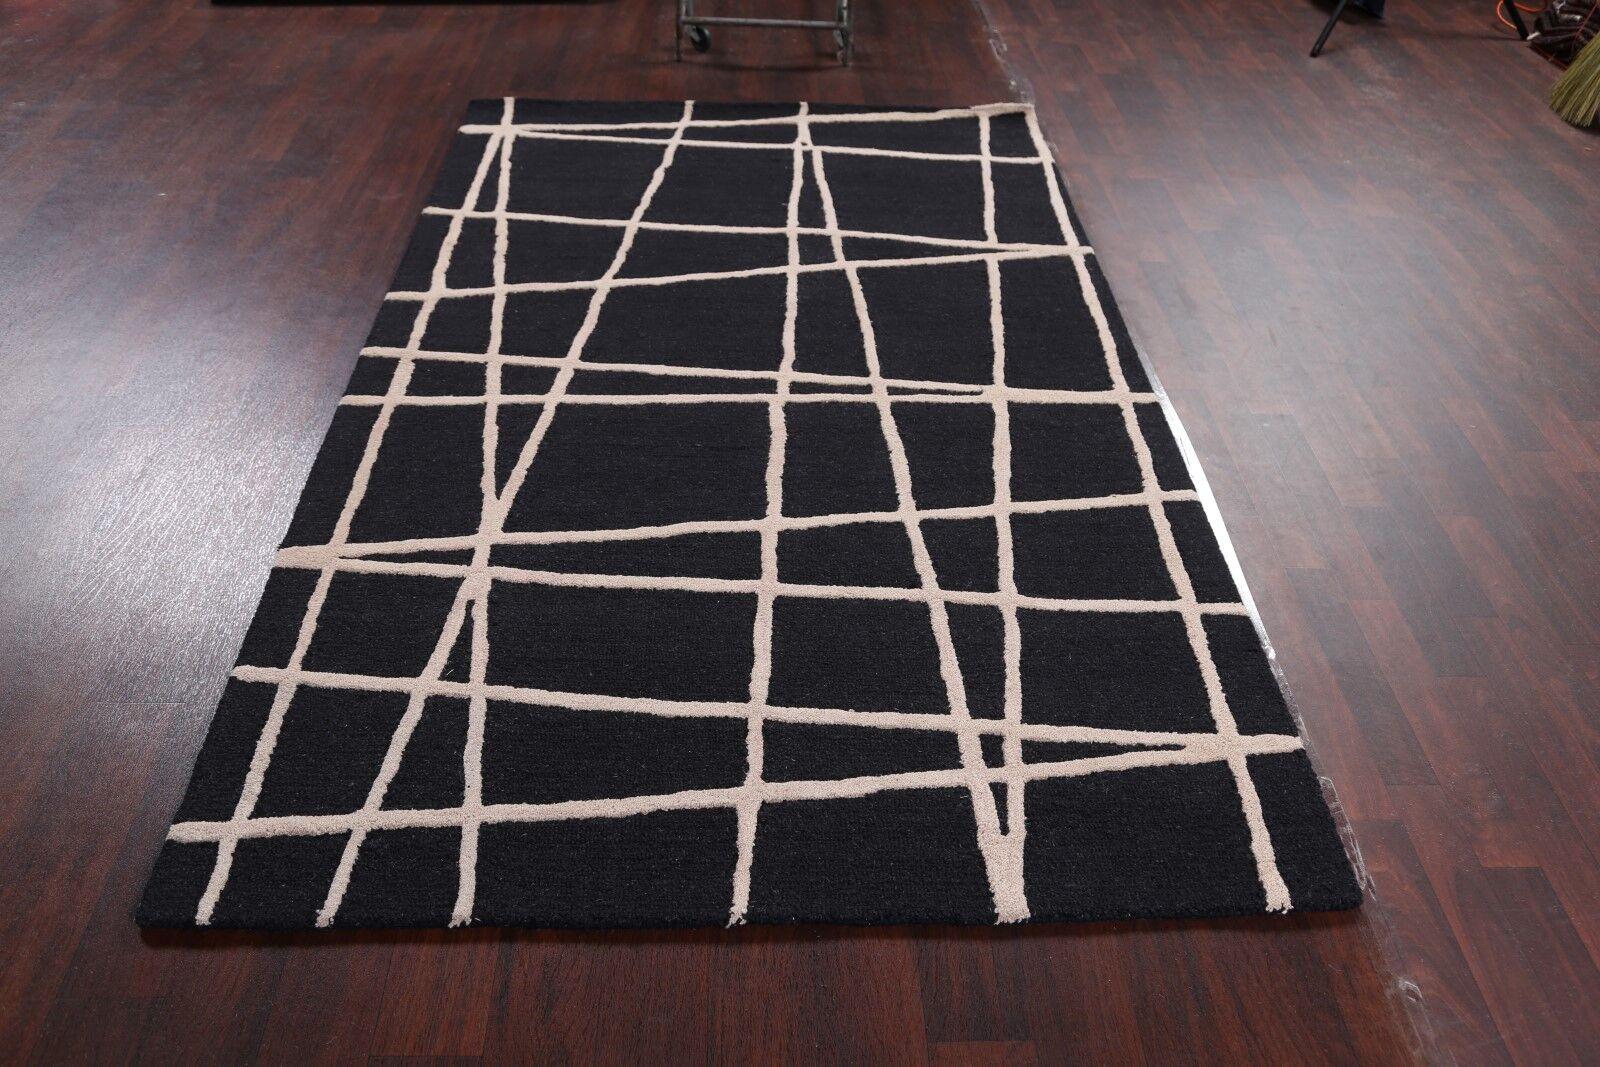 Larkin Oushak Indian Oriental Hand-Tufted Wool Black/White Area Rug